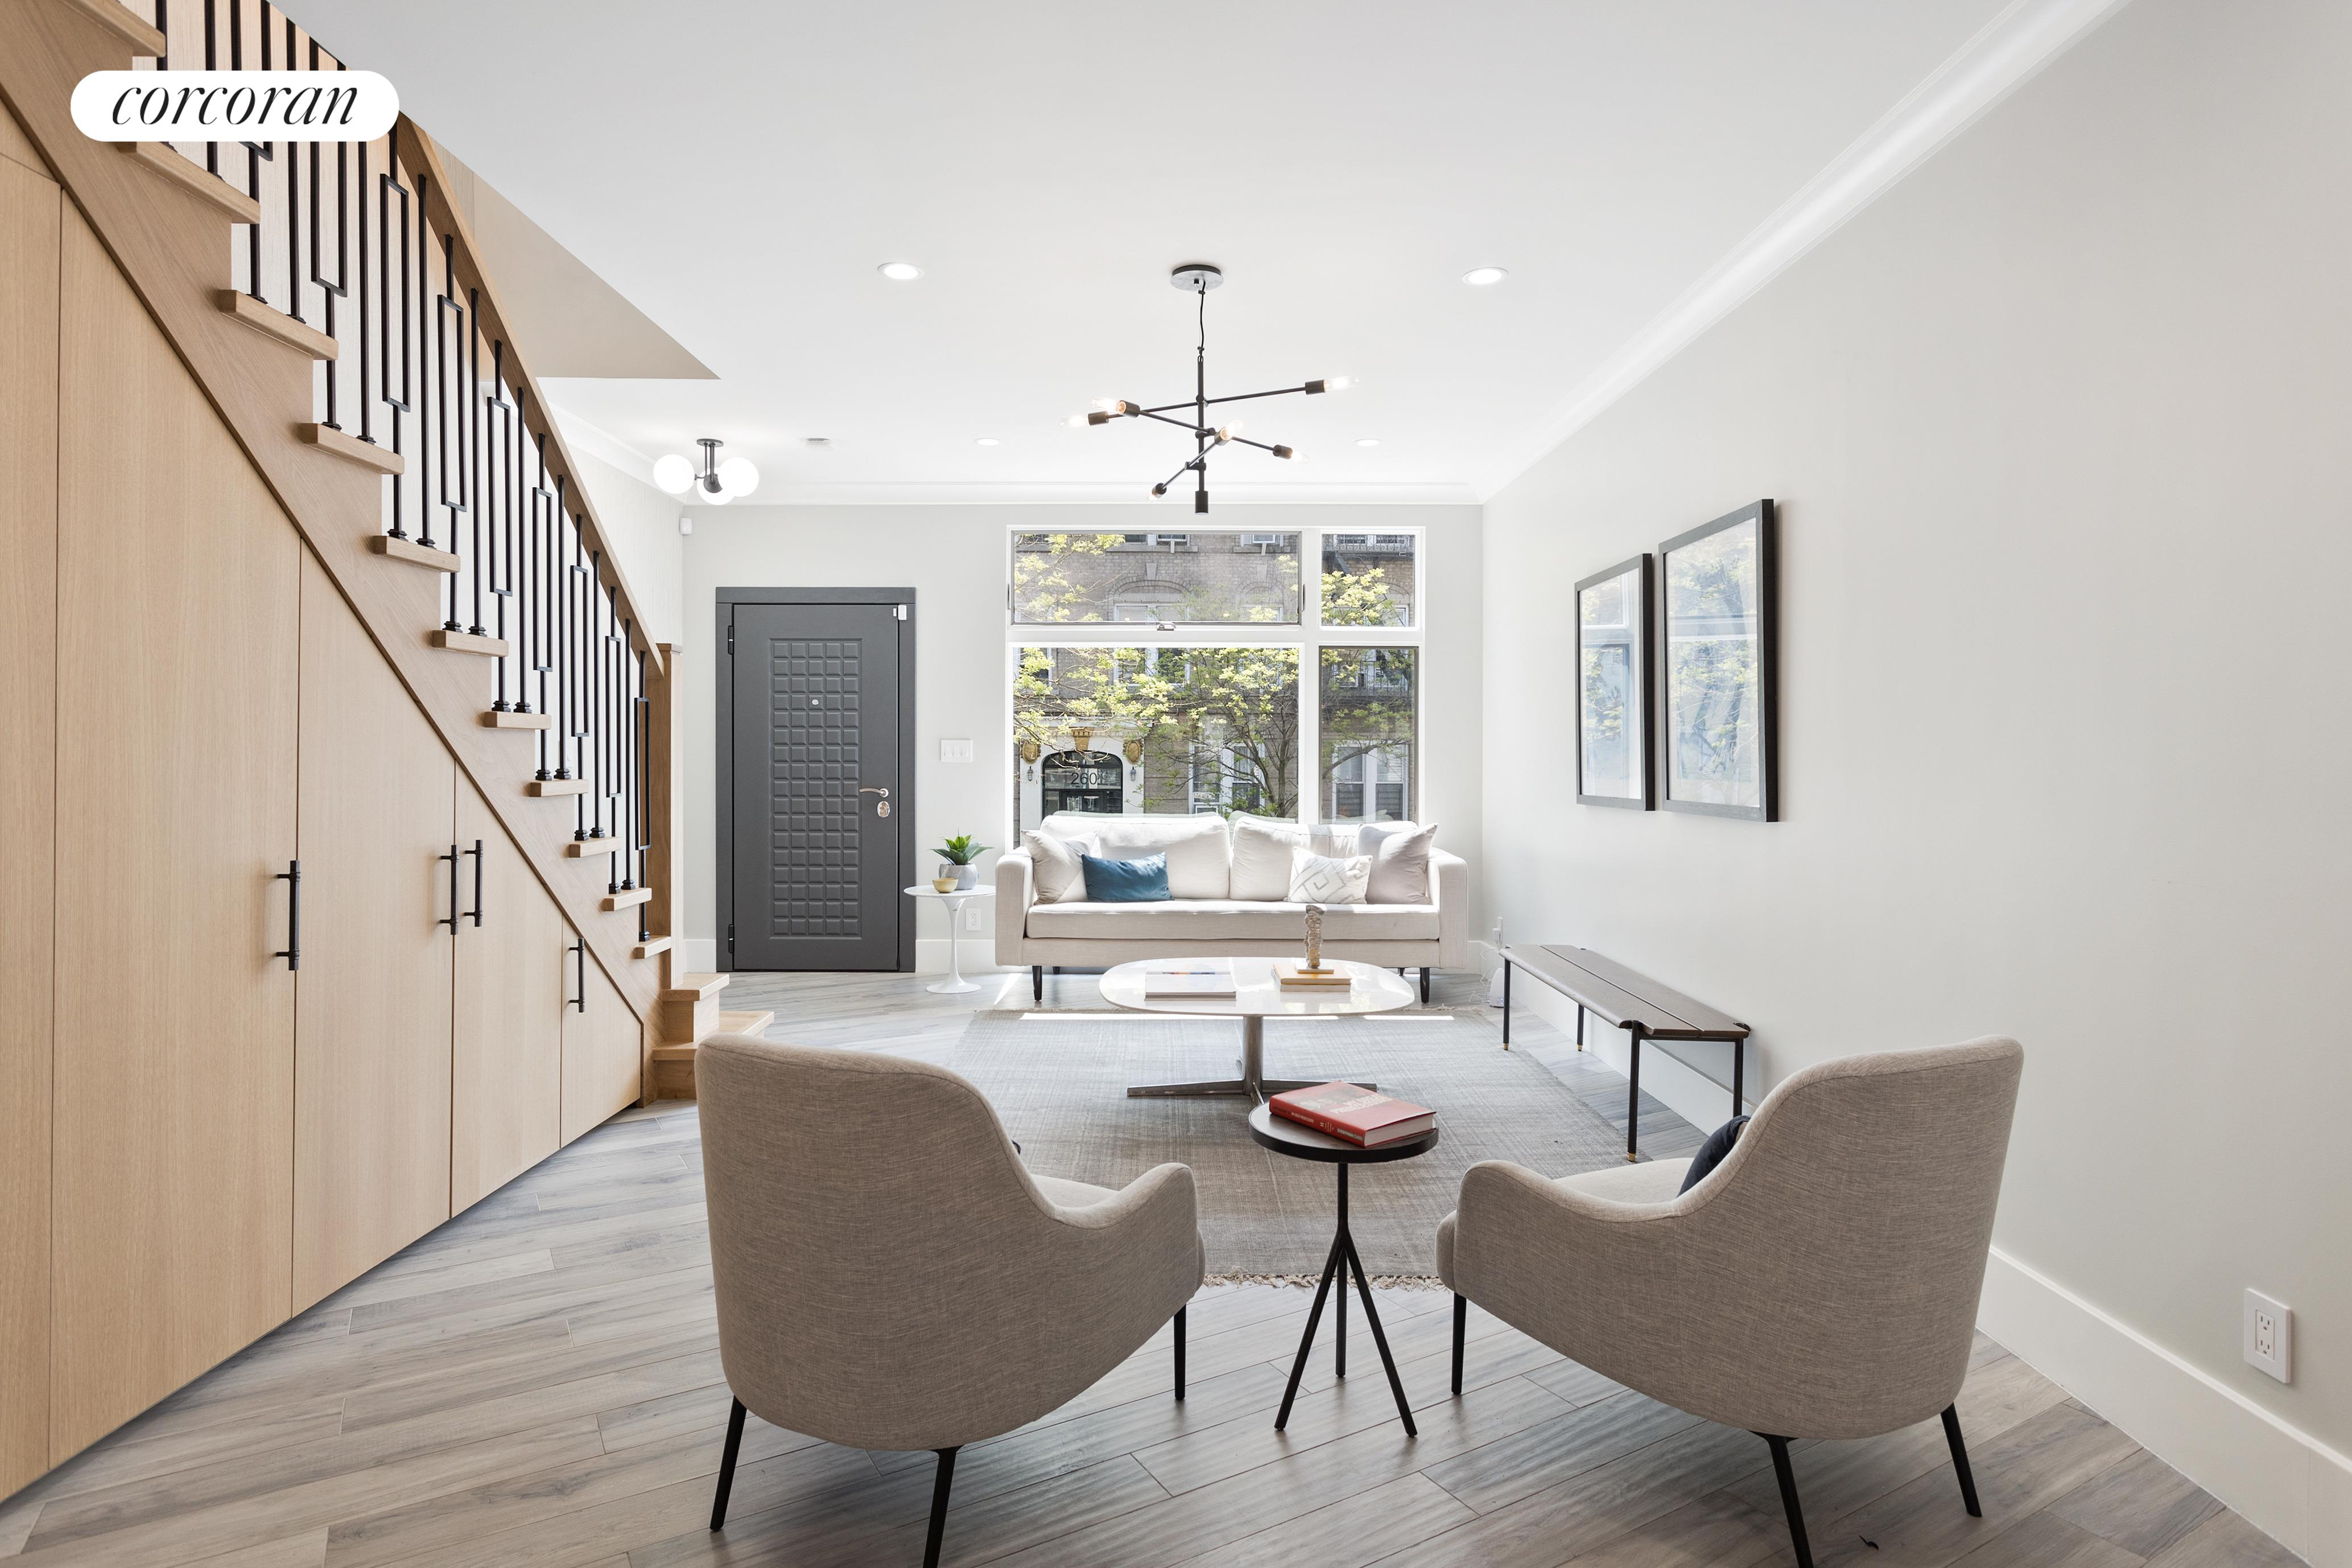 Corcoran, Bridget Applegate, Park Slope 125 Seventh Avenue Realtor